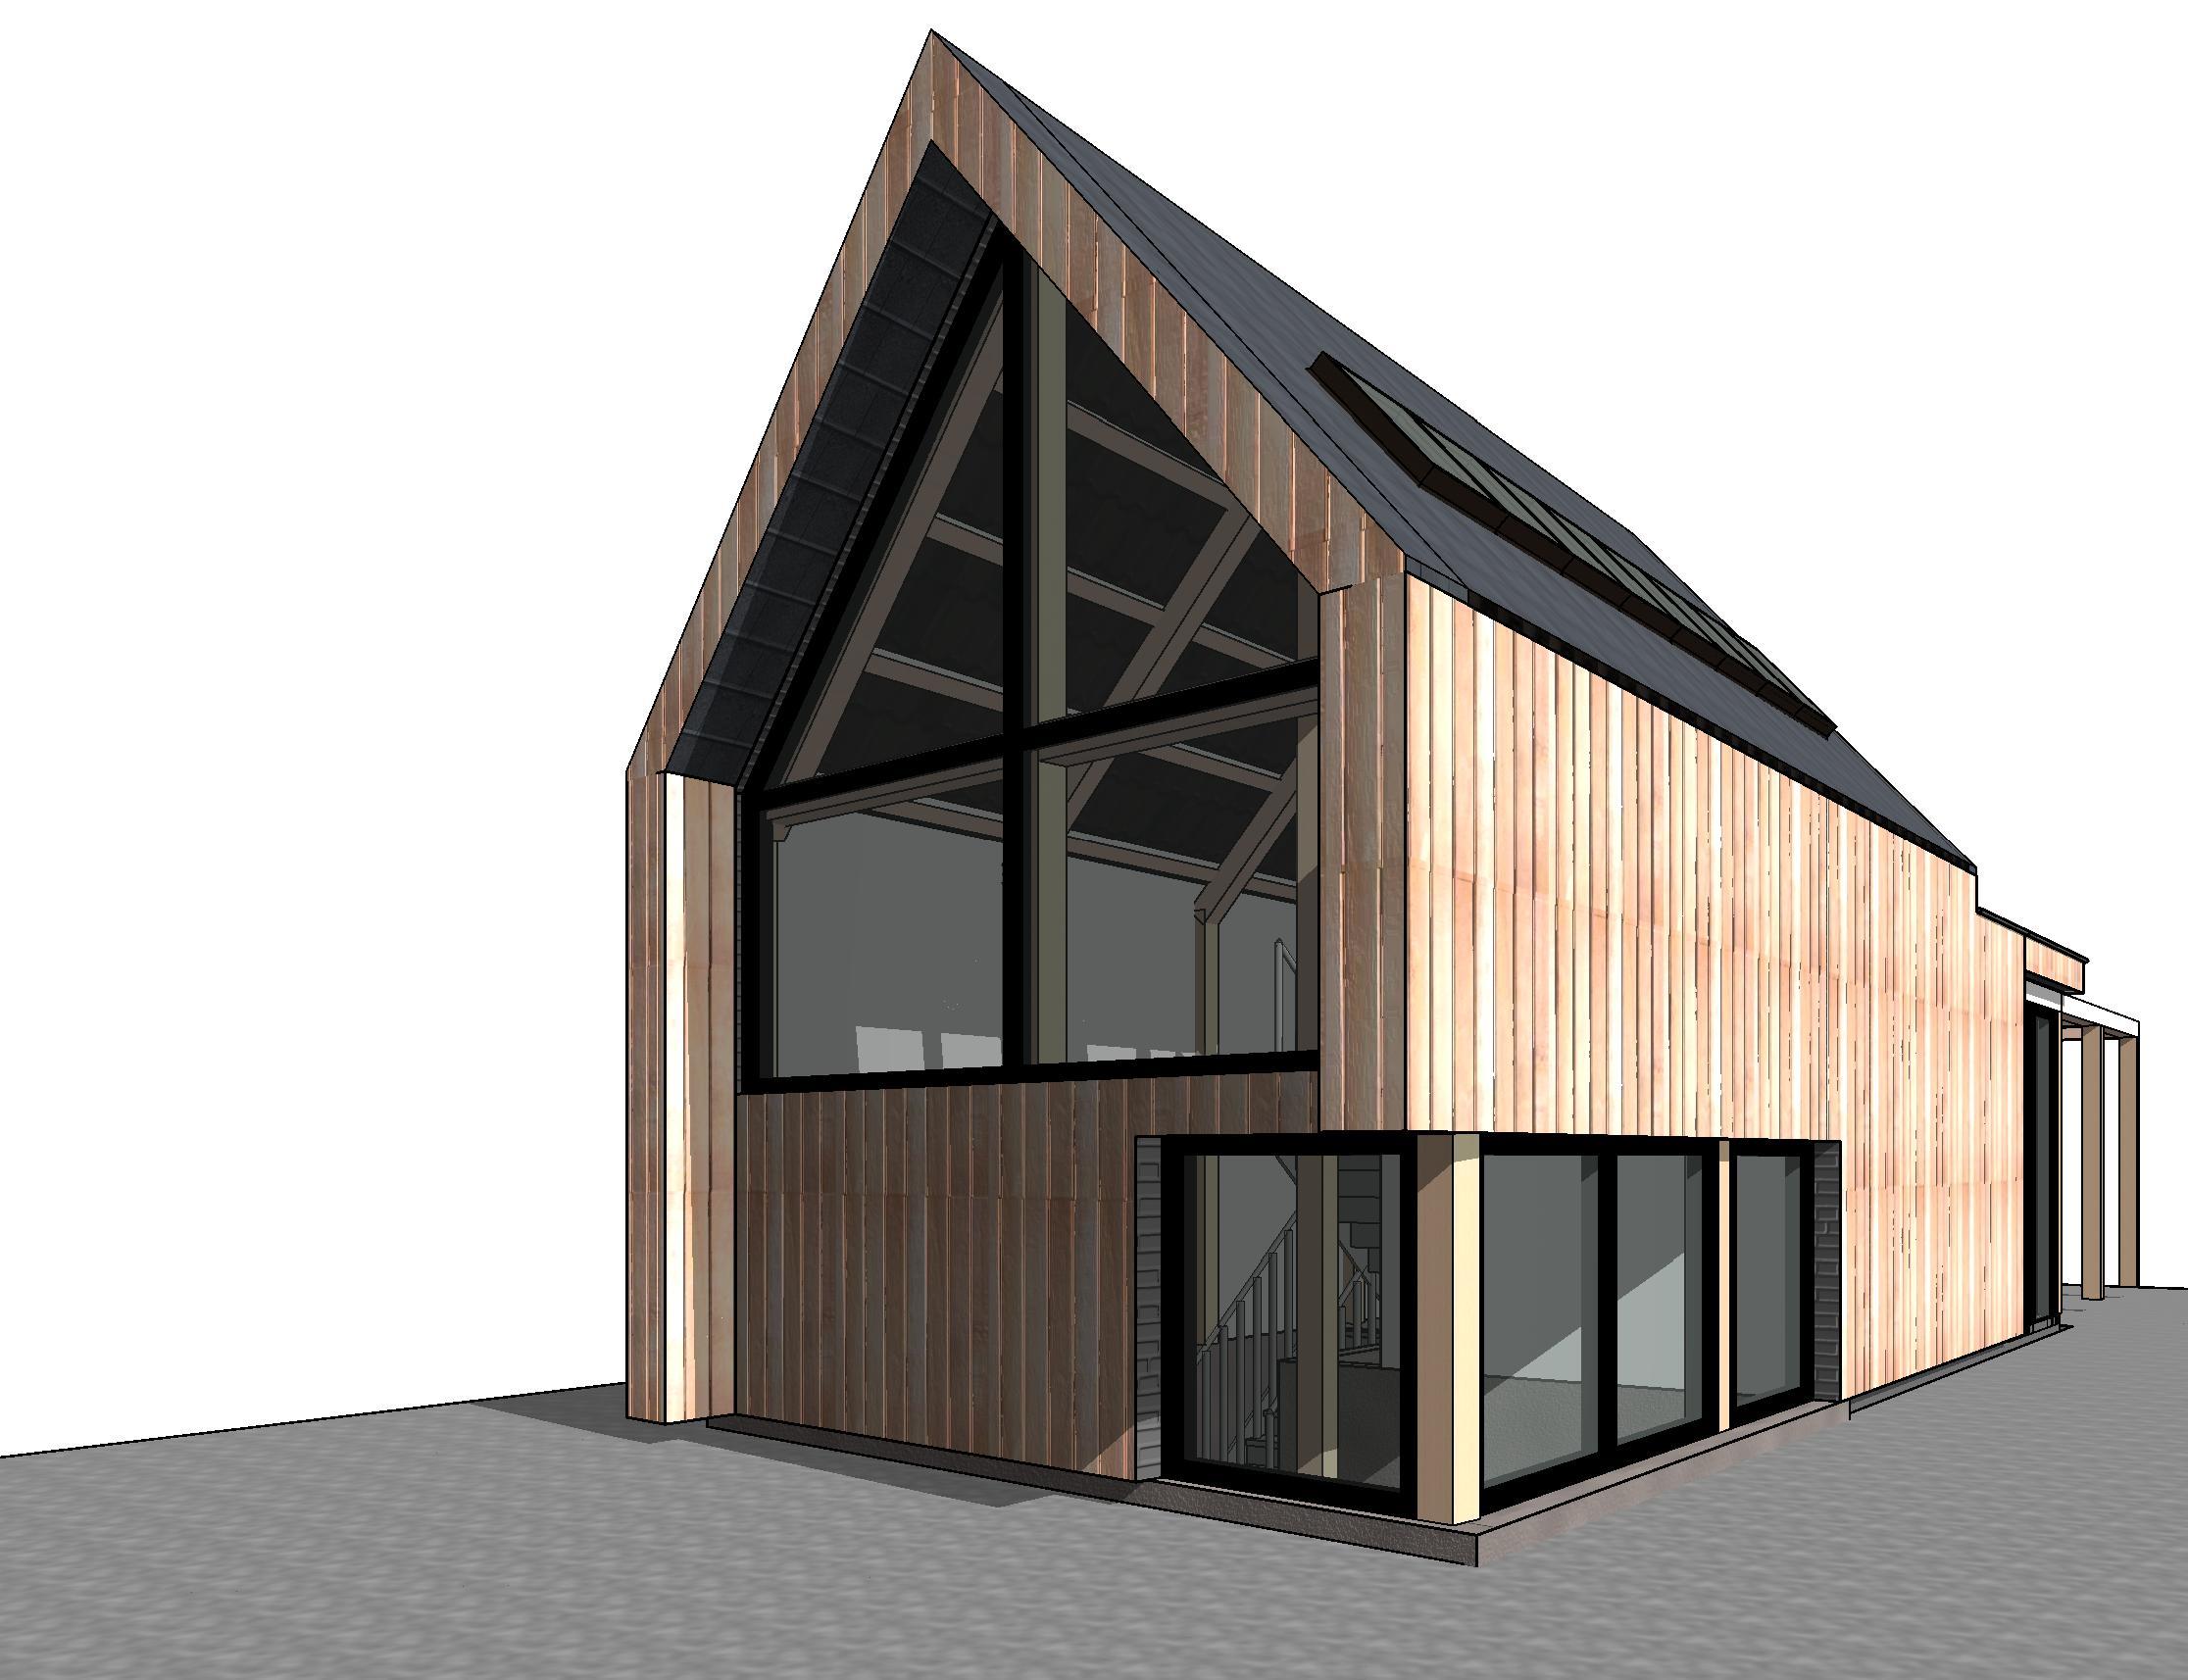 Modern tuinhuis in schagen moderne woning nico dekker ontwerp bouwkunde - Ontwerp tuinhuis ...